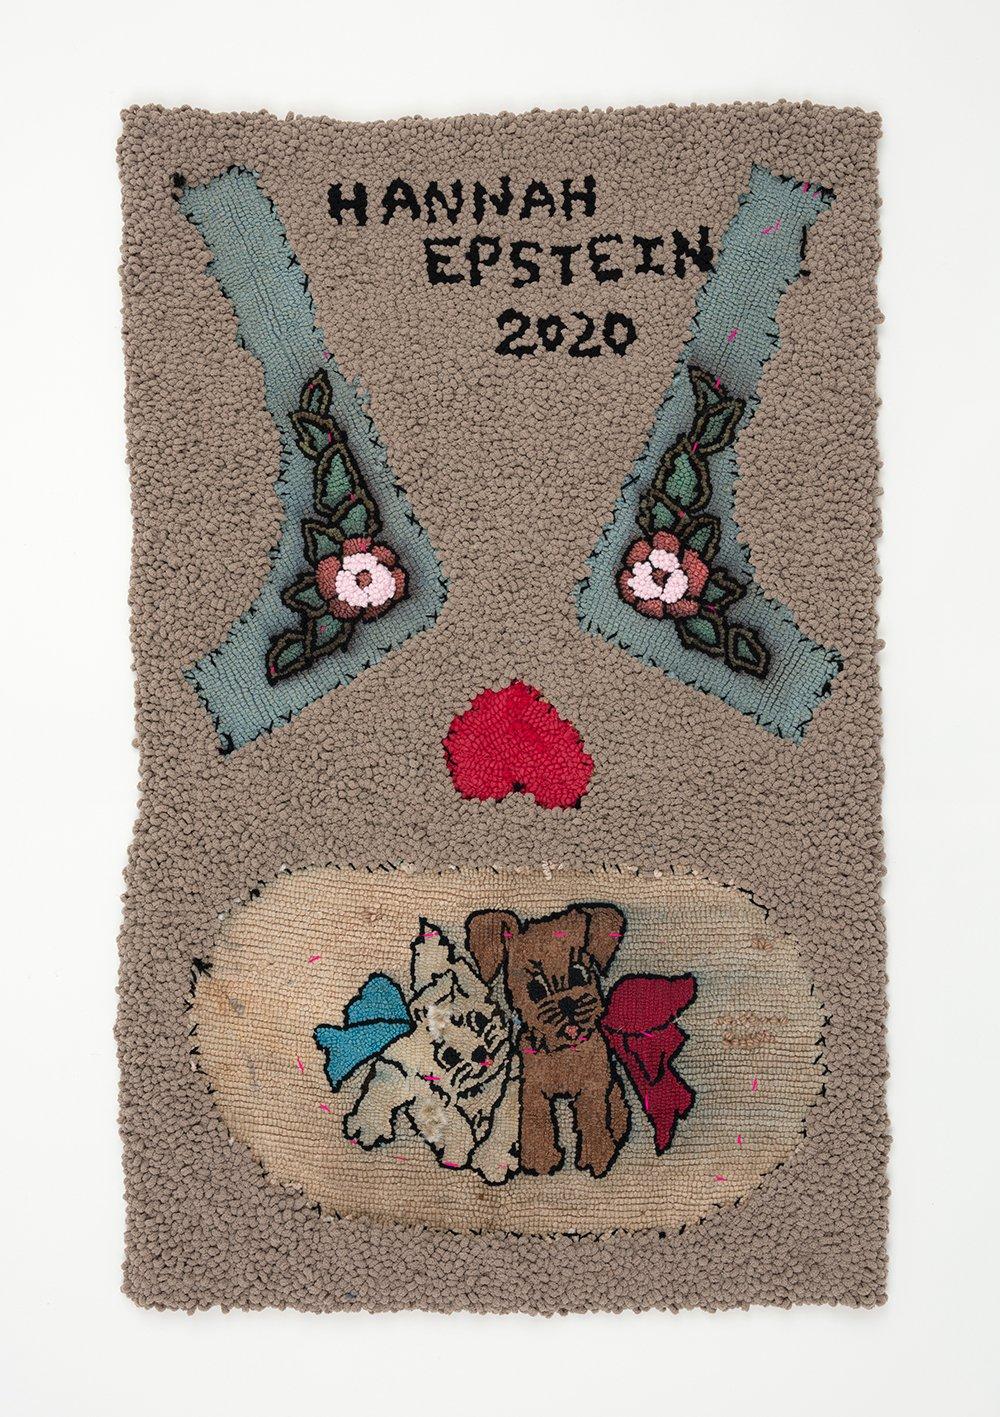 Hannah Epstein 2020